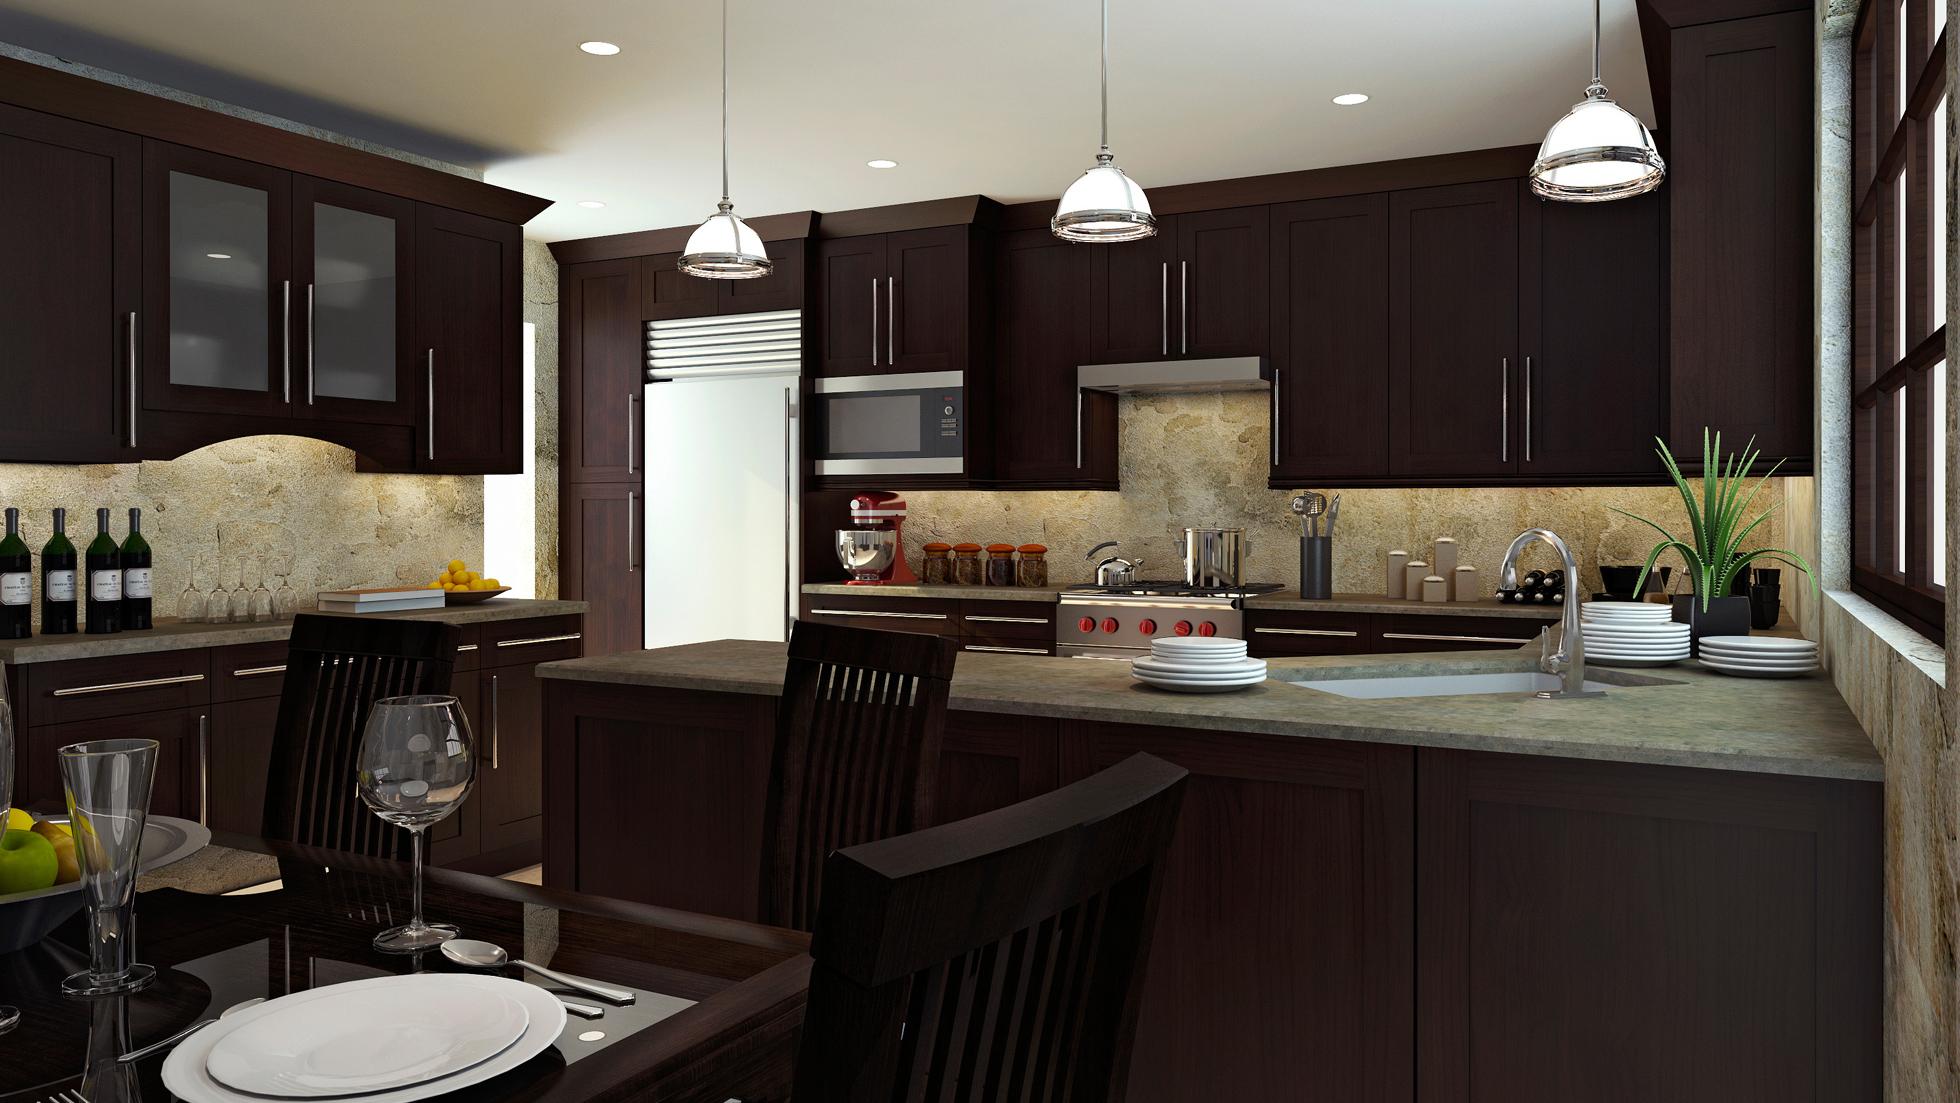 Madison  BJ Floors and Kitchens